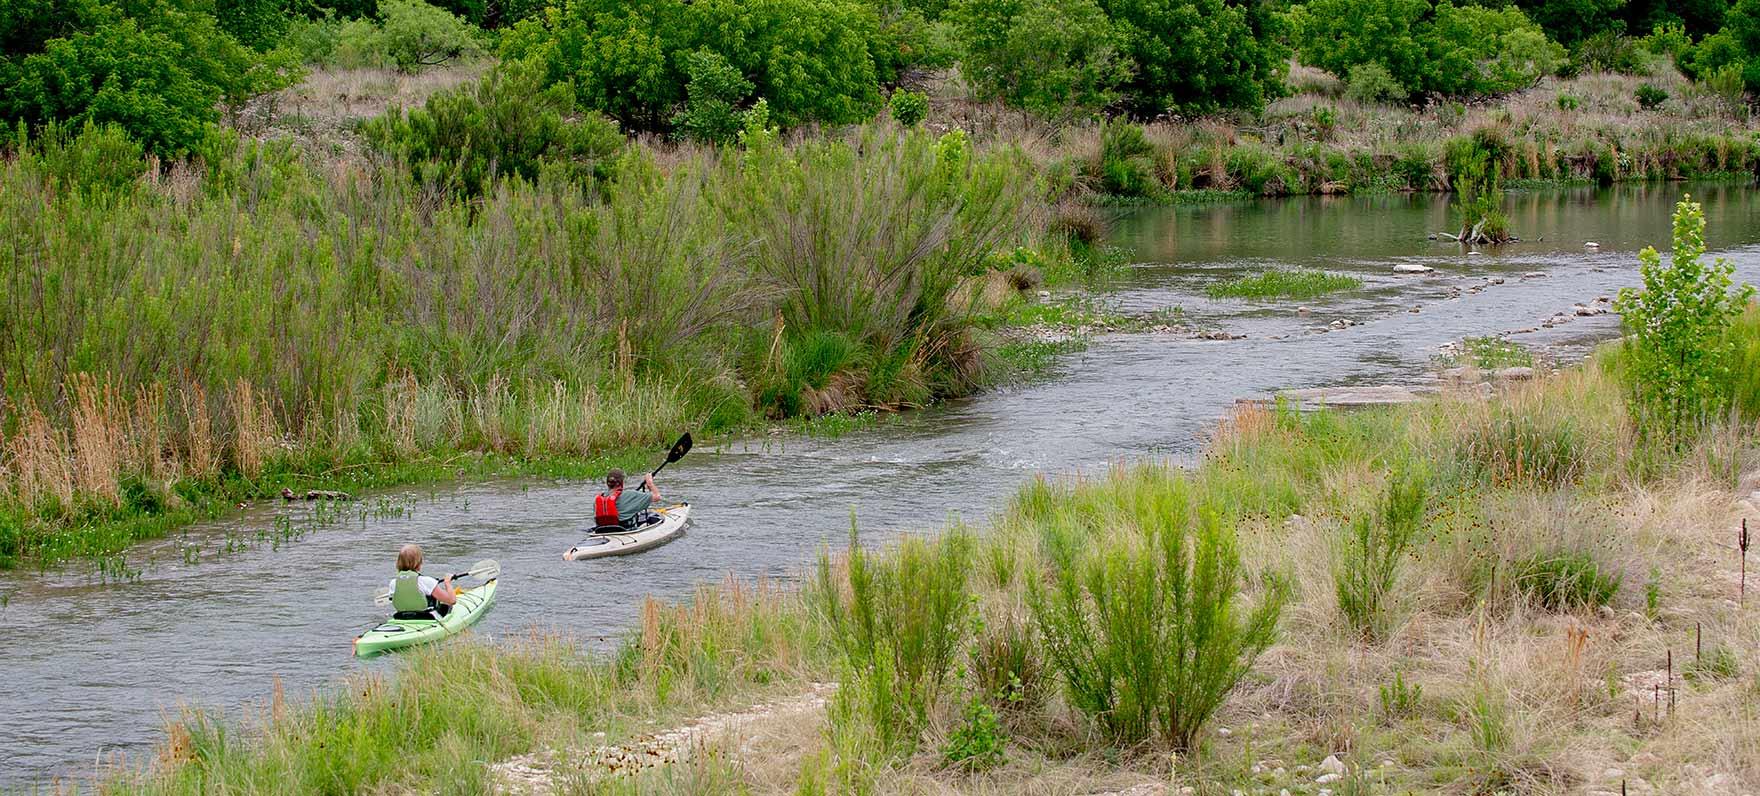 Best rivers in Texas: Llano River